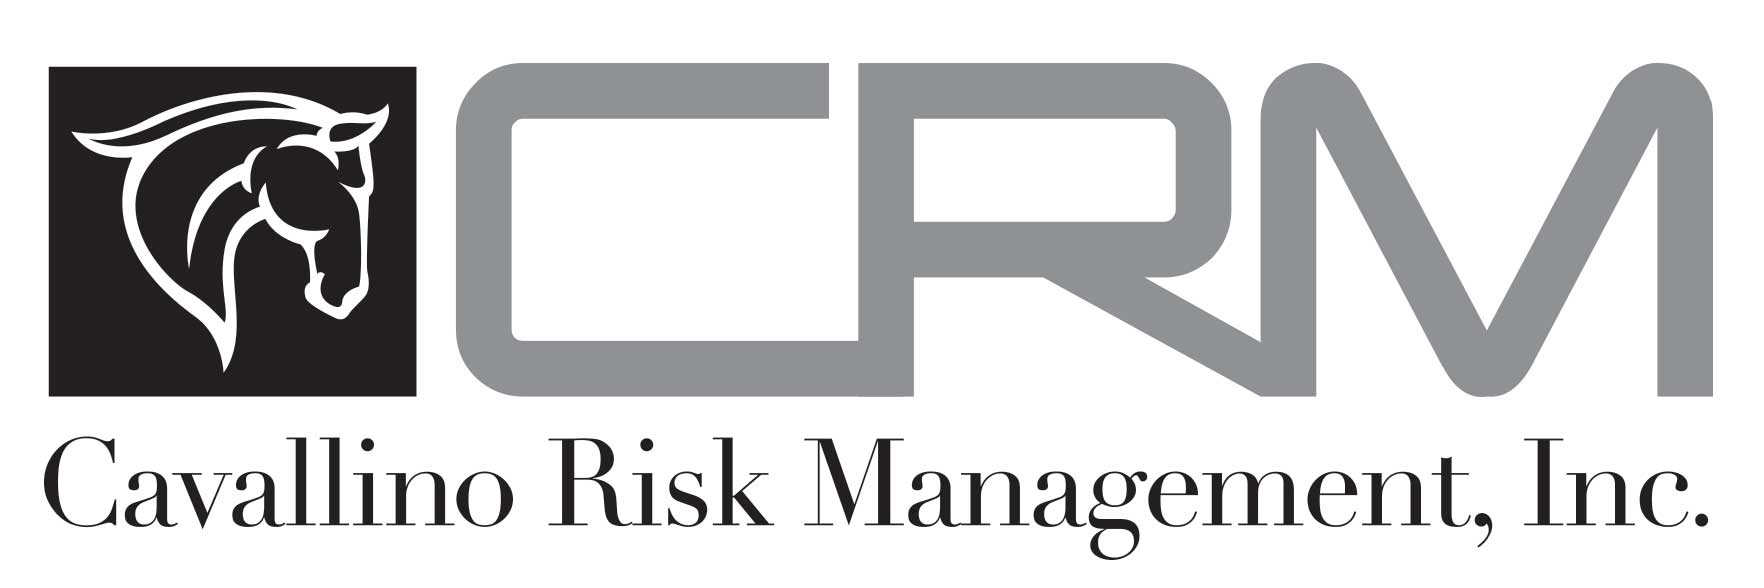 CAVALLINO RISK  MANAGEMENT, INC. – TRUCK INSURANCE SPECIALISTS